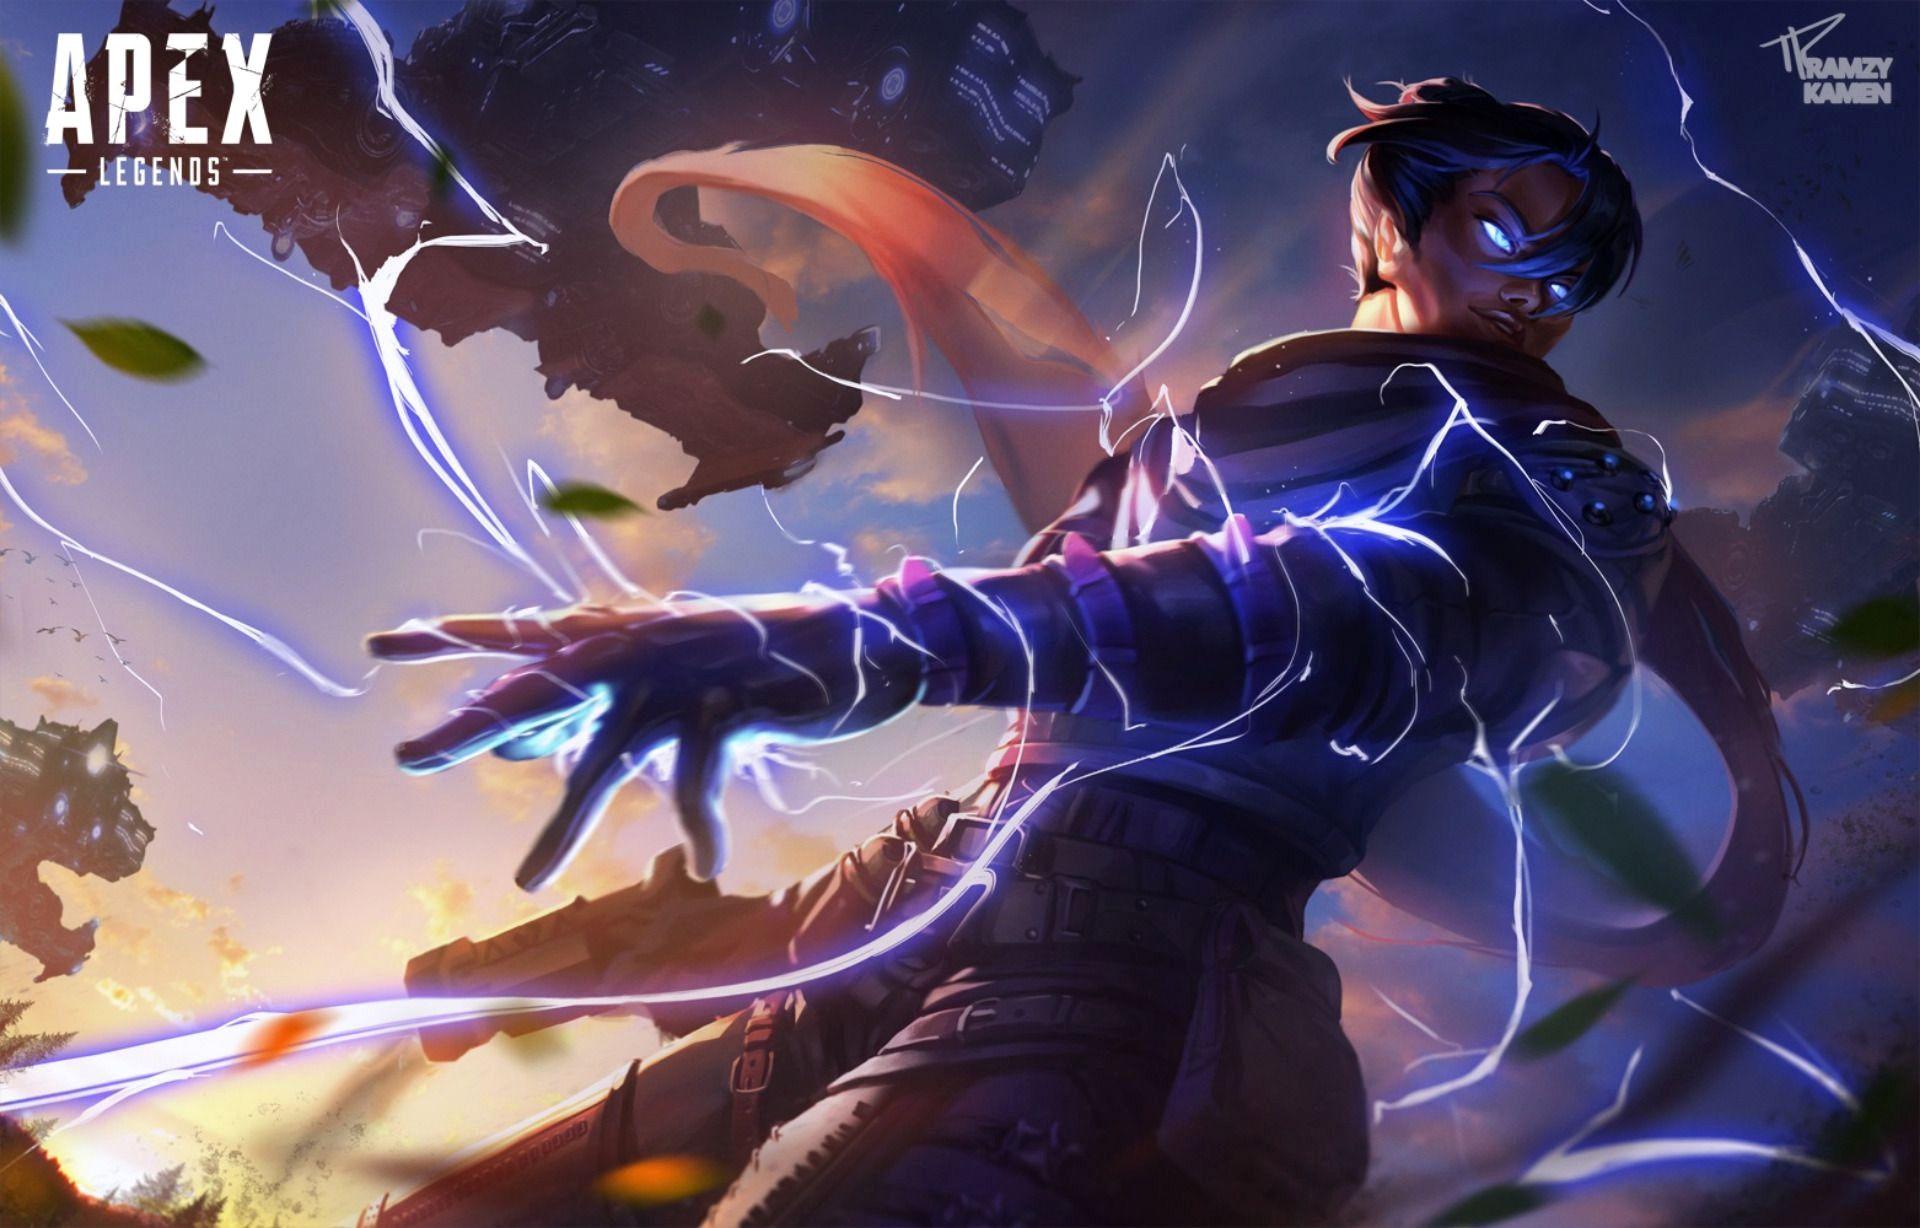 Beautiful Apex Legends Wraith Interdimensional Skirmisher